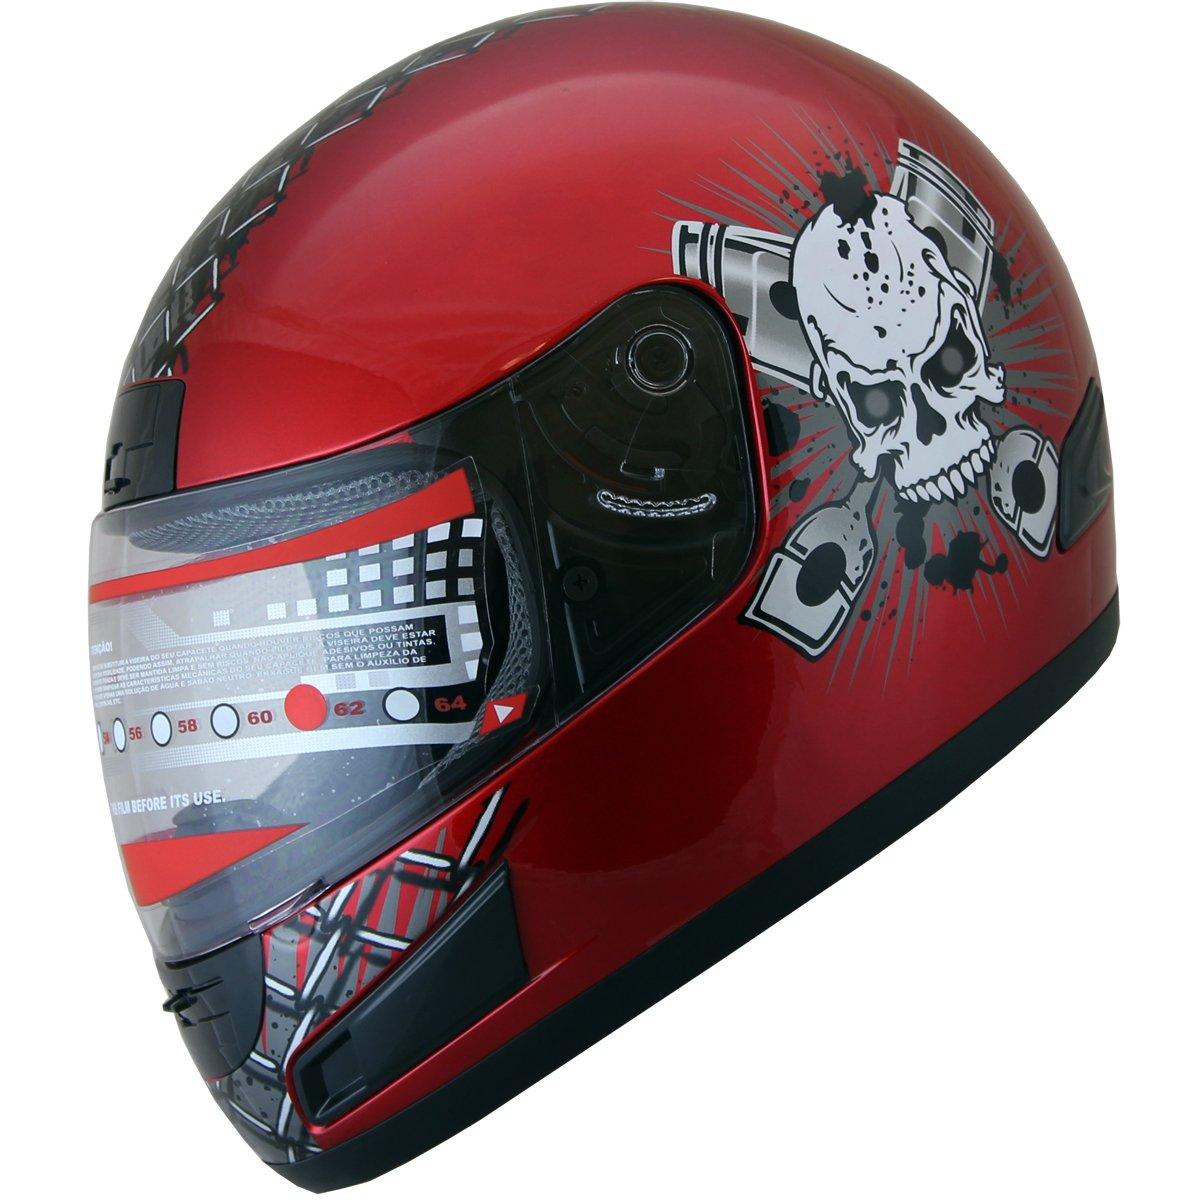 Motorcycle Helmet Full Face sports Bike Helmet skull F114 Wine Red (Med) by X4